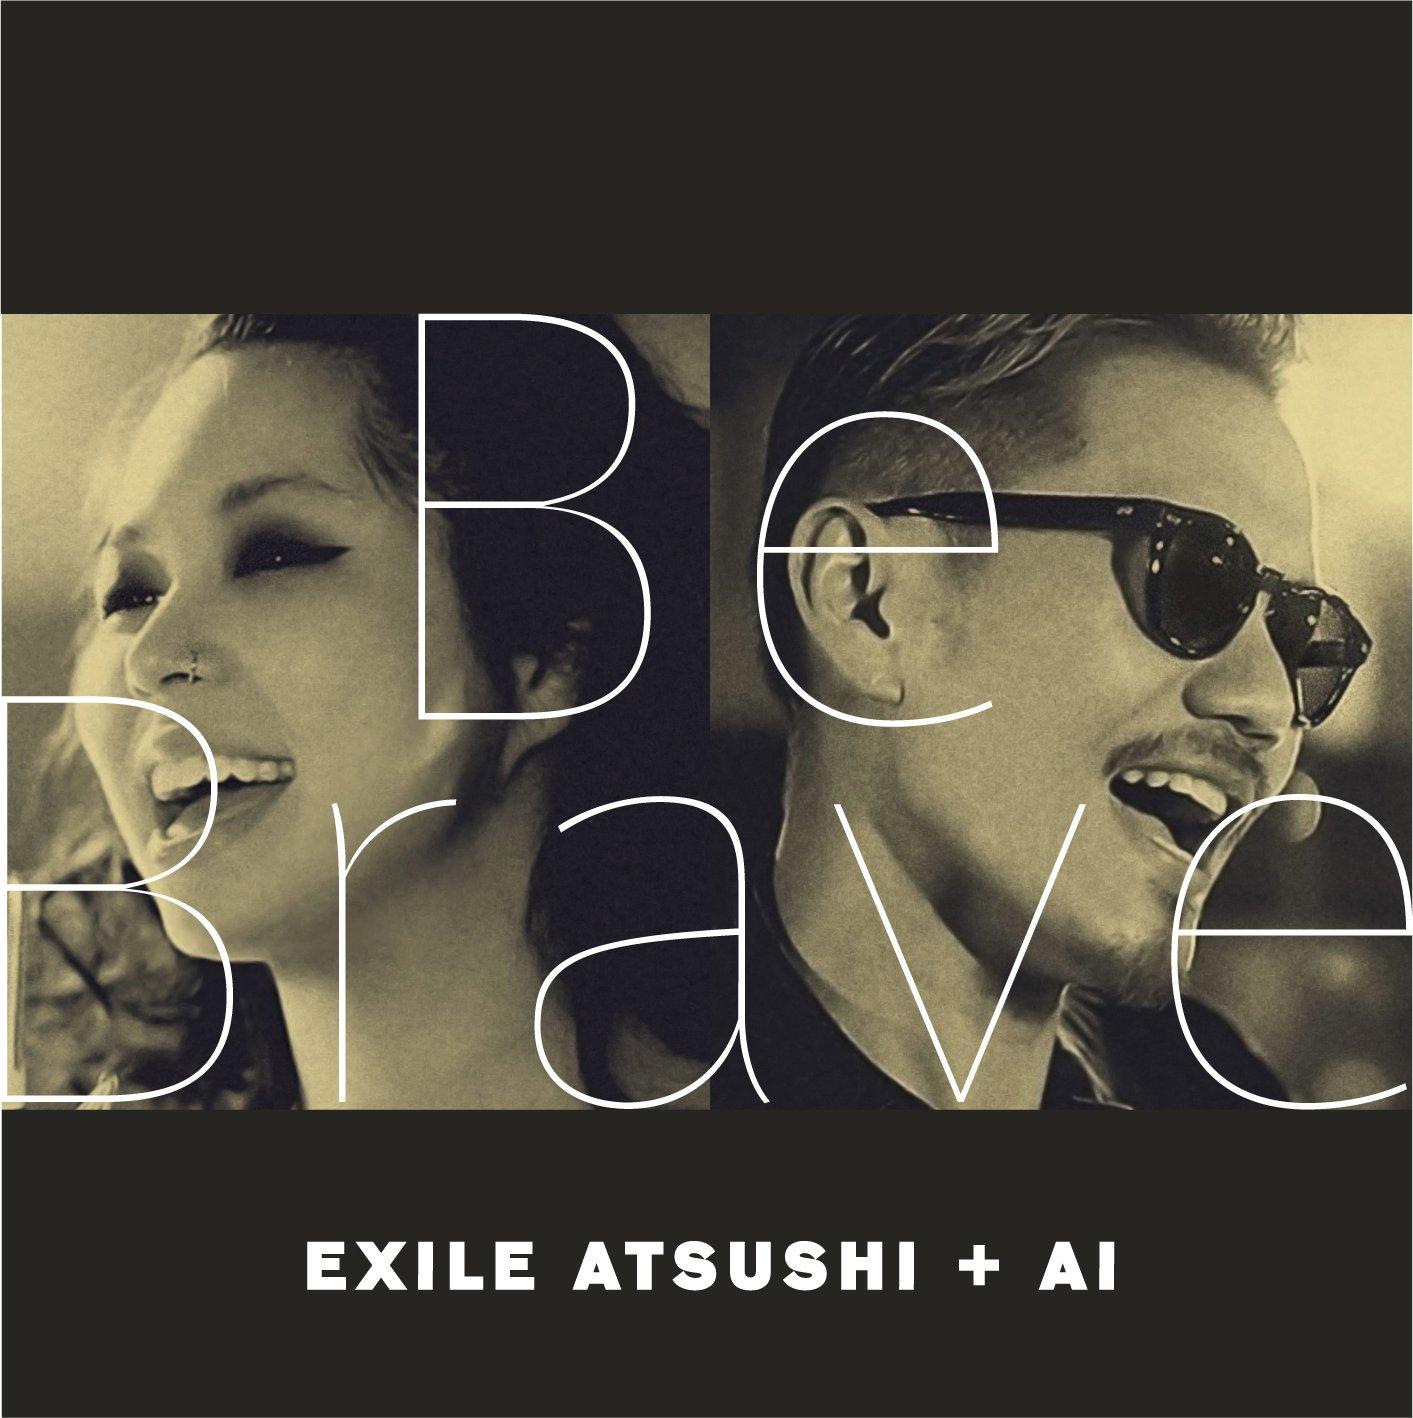 EXILE ATSUSHI+AI 「Be Brave」